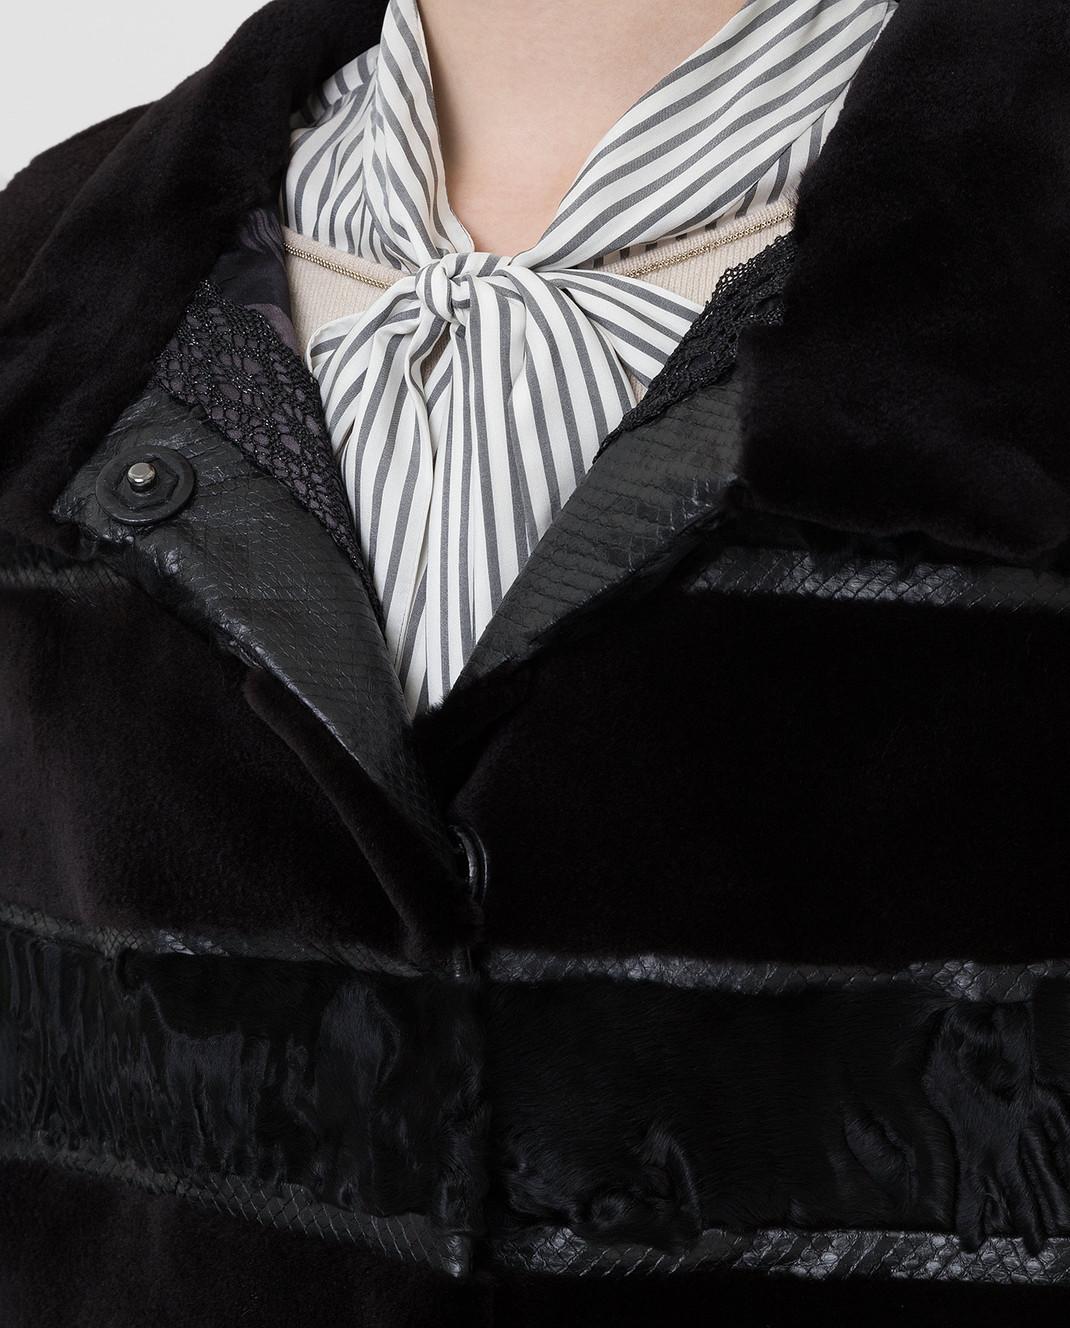 Florence Mode Черная шуба из меха норки и меха ягненка L1434 изображение 5